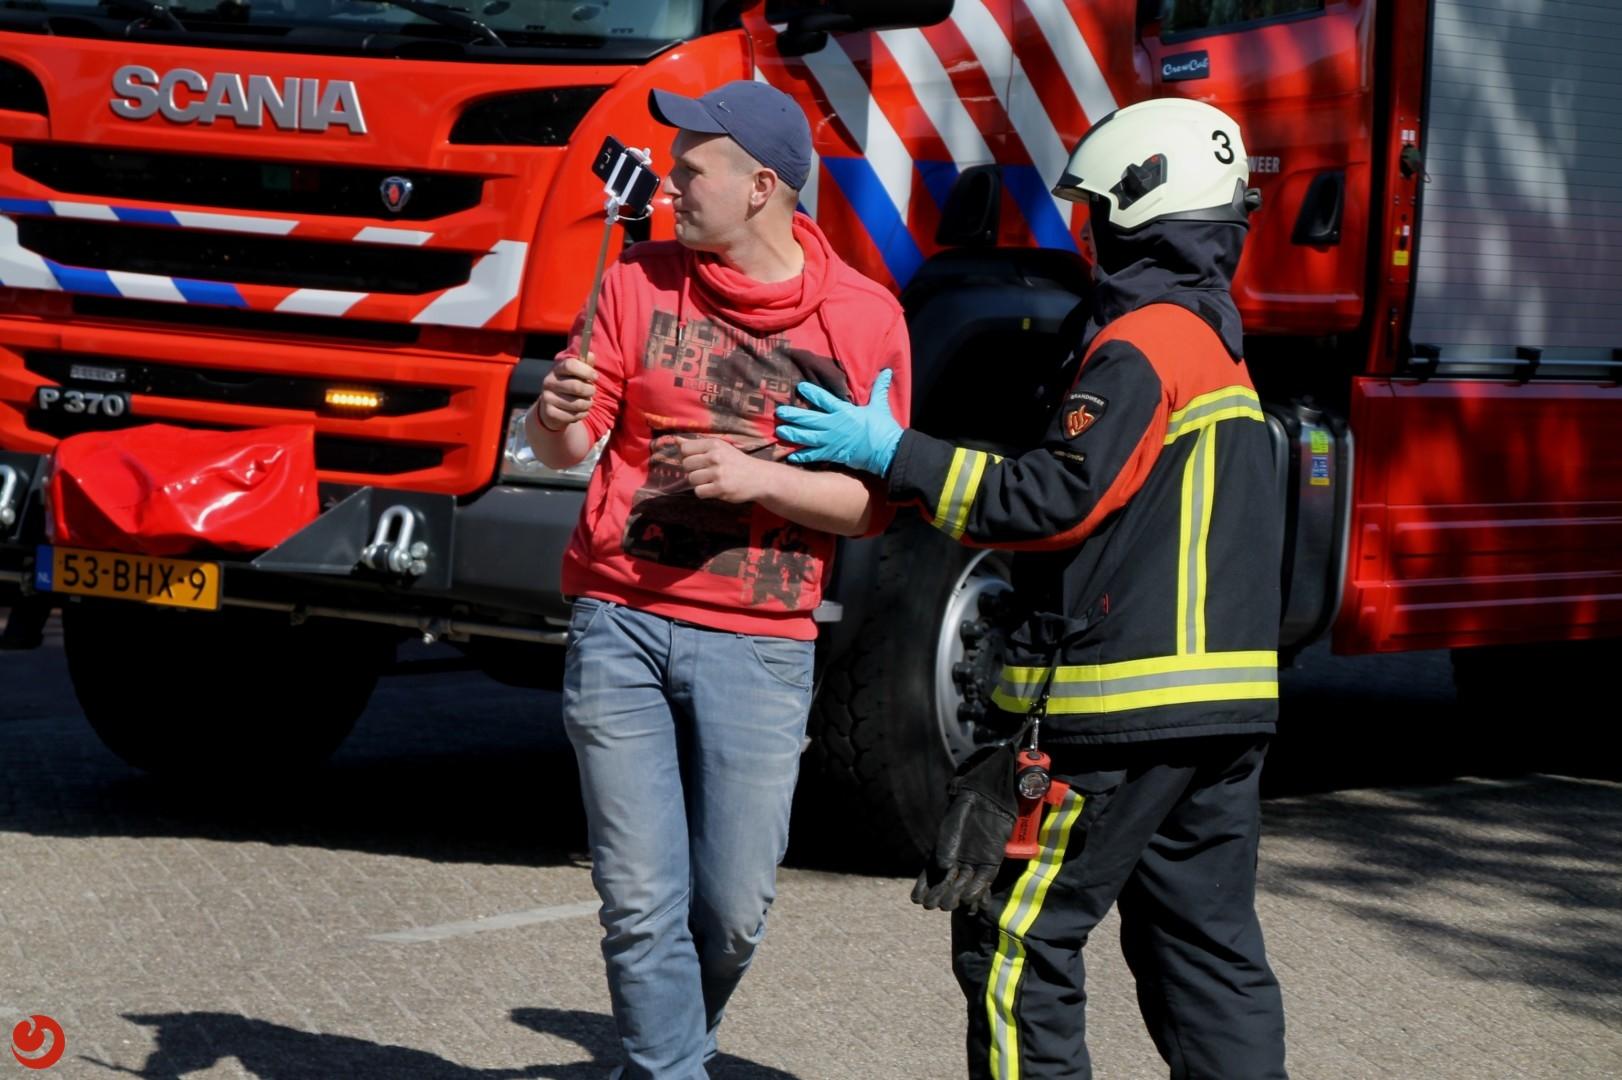 Brandweer Wommels wint brandweerwedstrijden